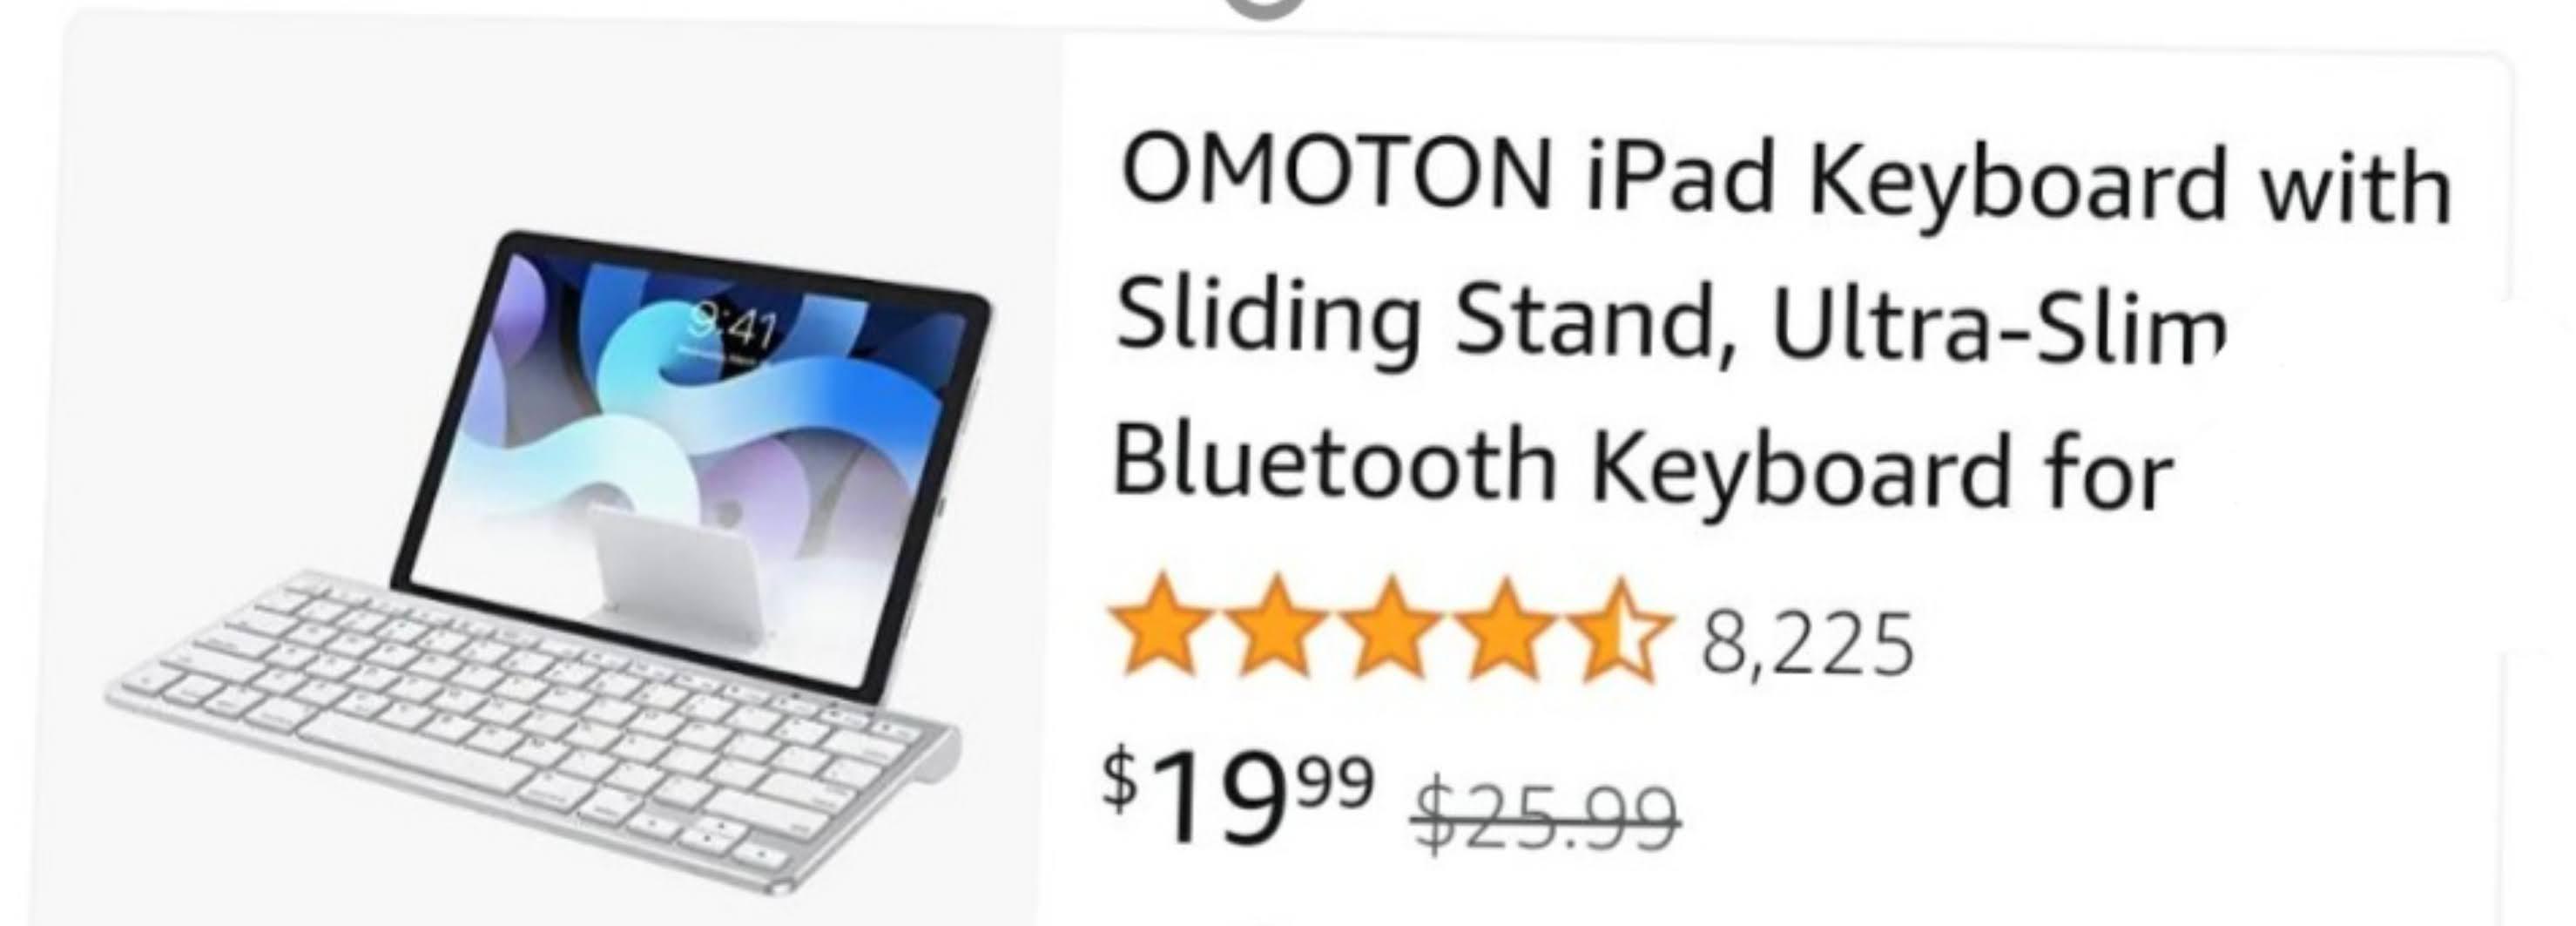 OMOTON iPad Bluetooth keyboard with sliding stand $19.99